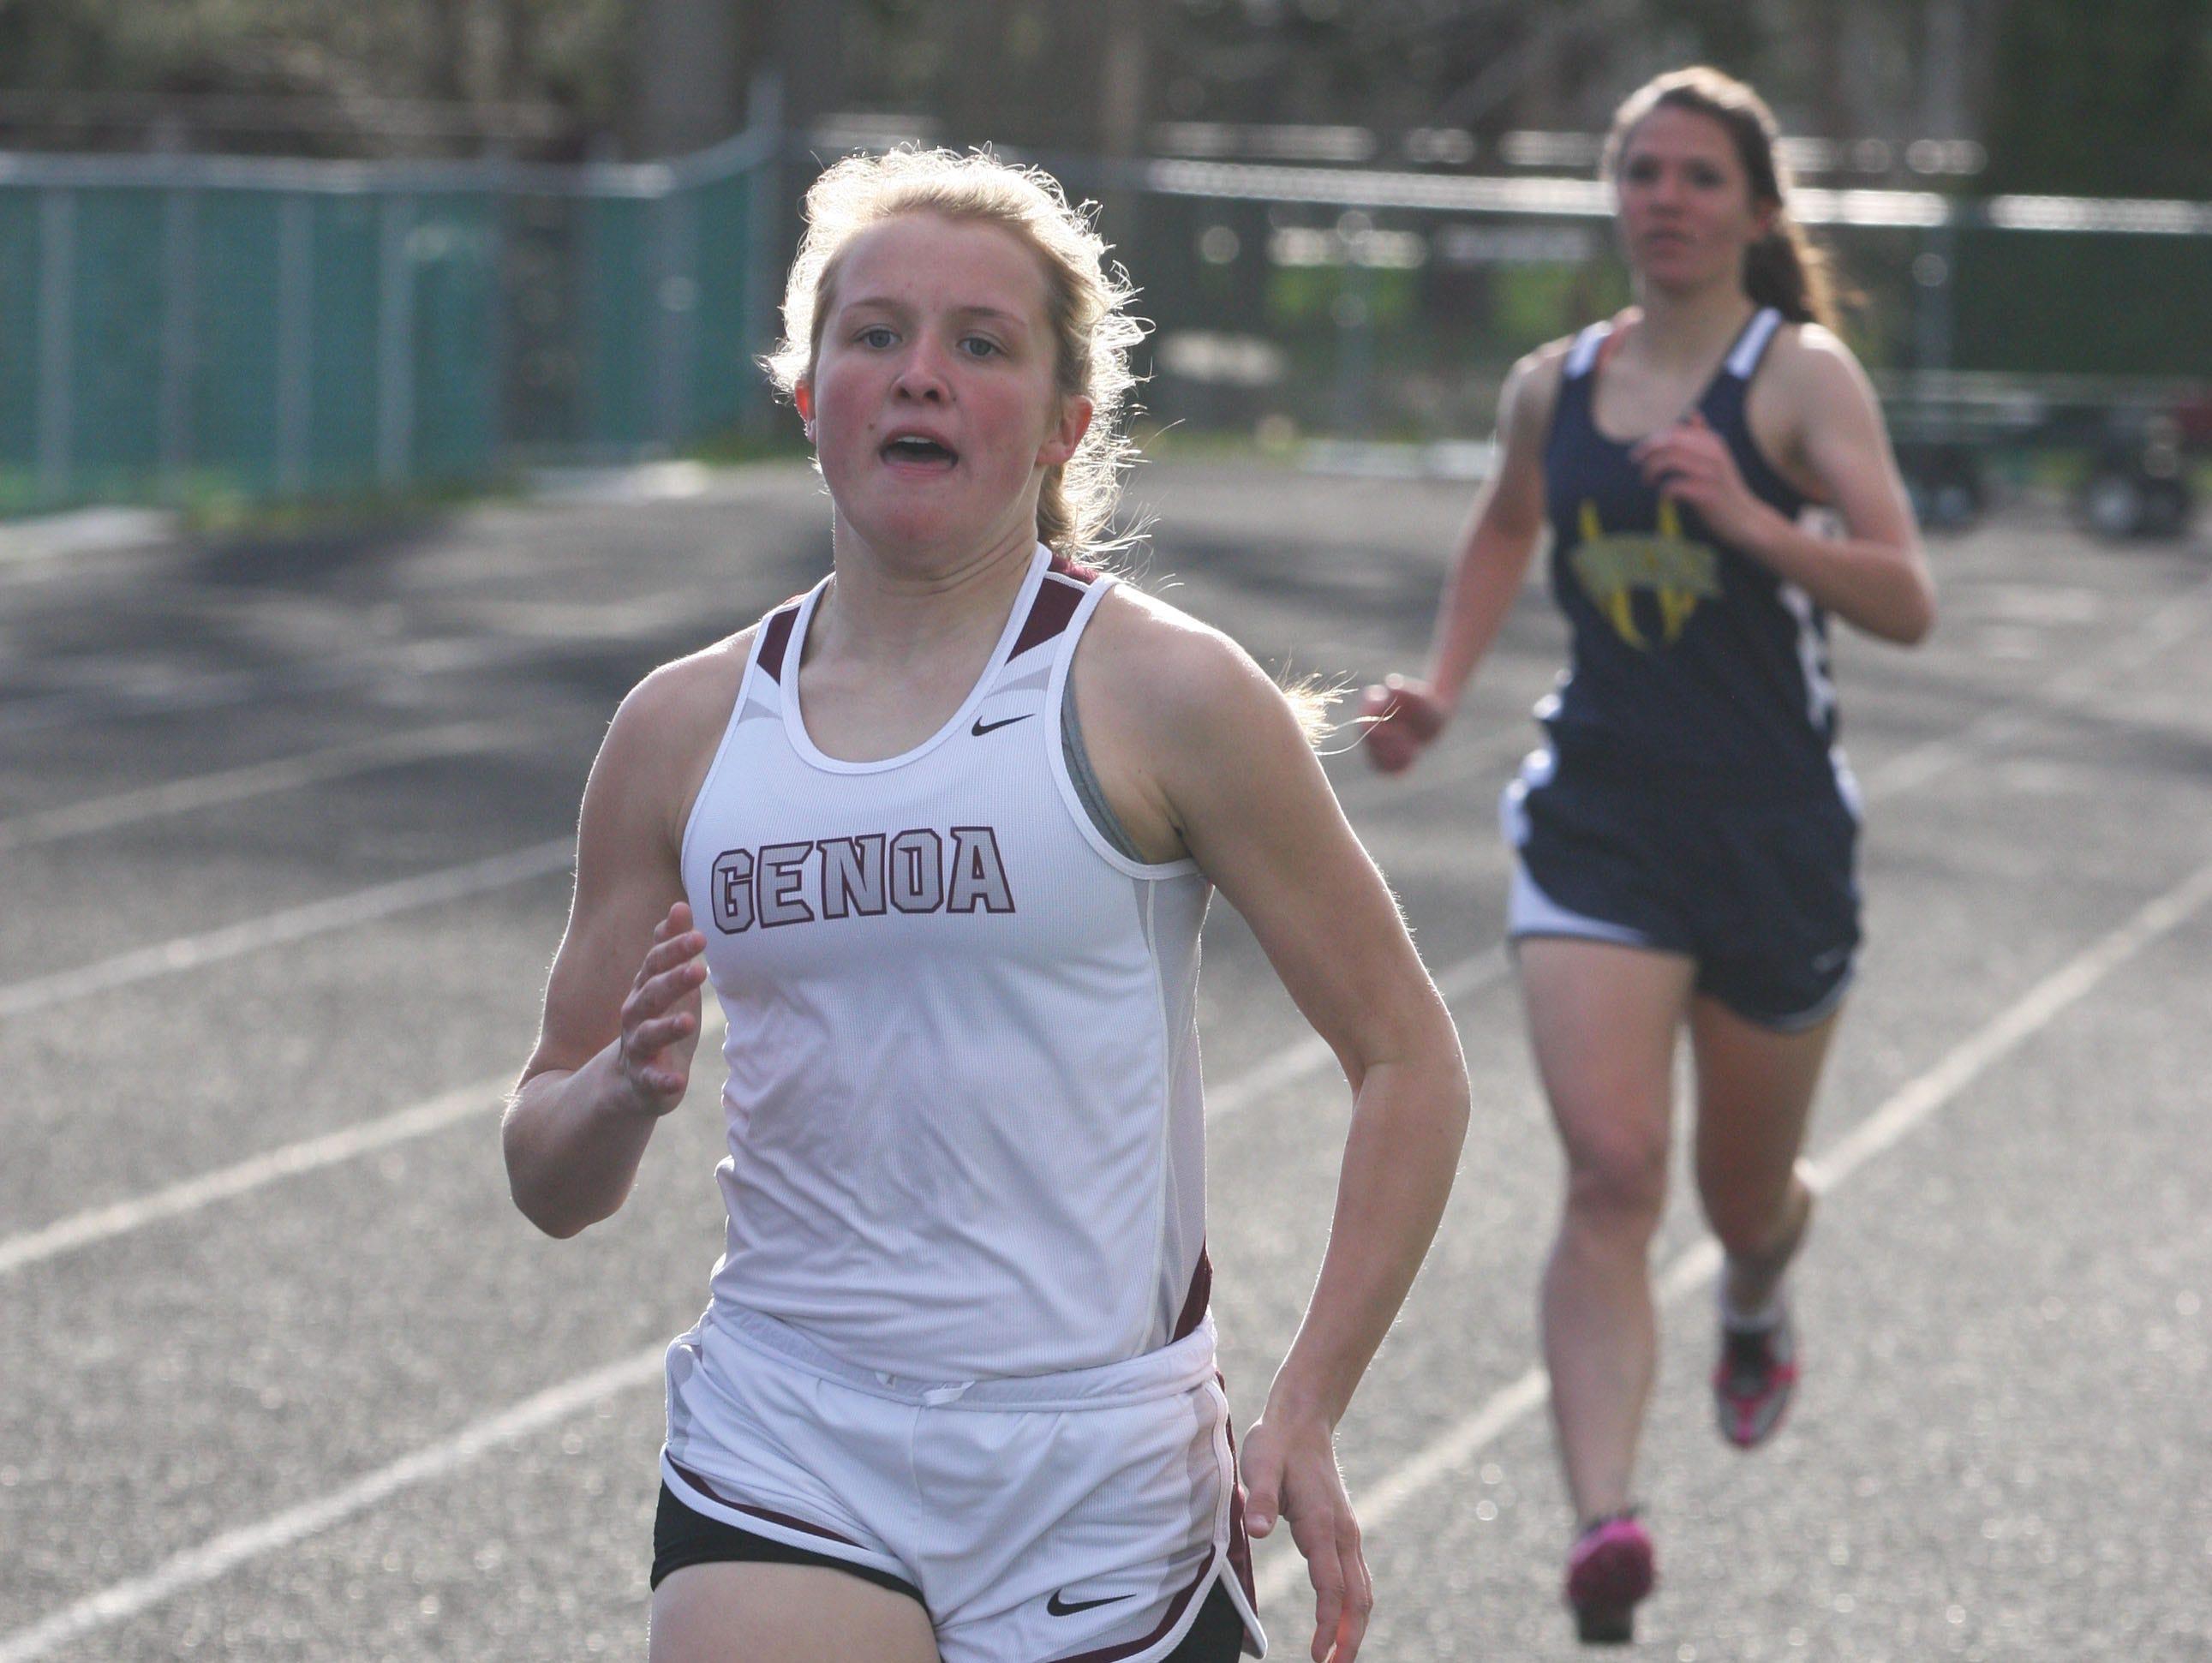 Genoa's Carly Gose pulls away from Woodmore's Jessie Wegert to win the 200 meter run.